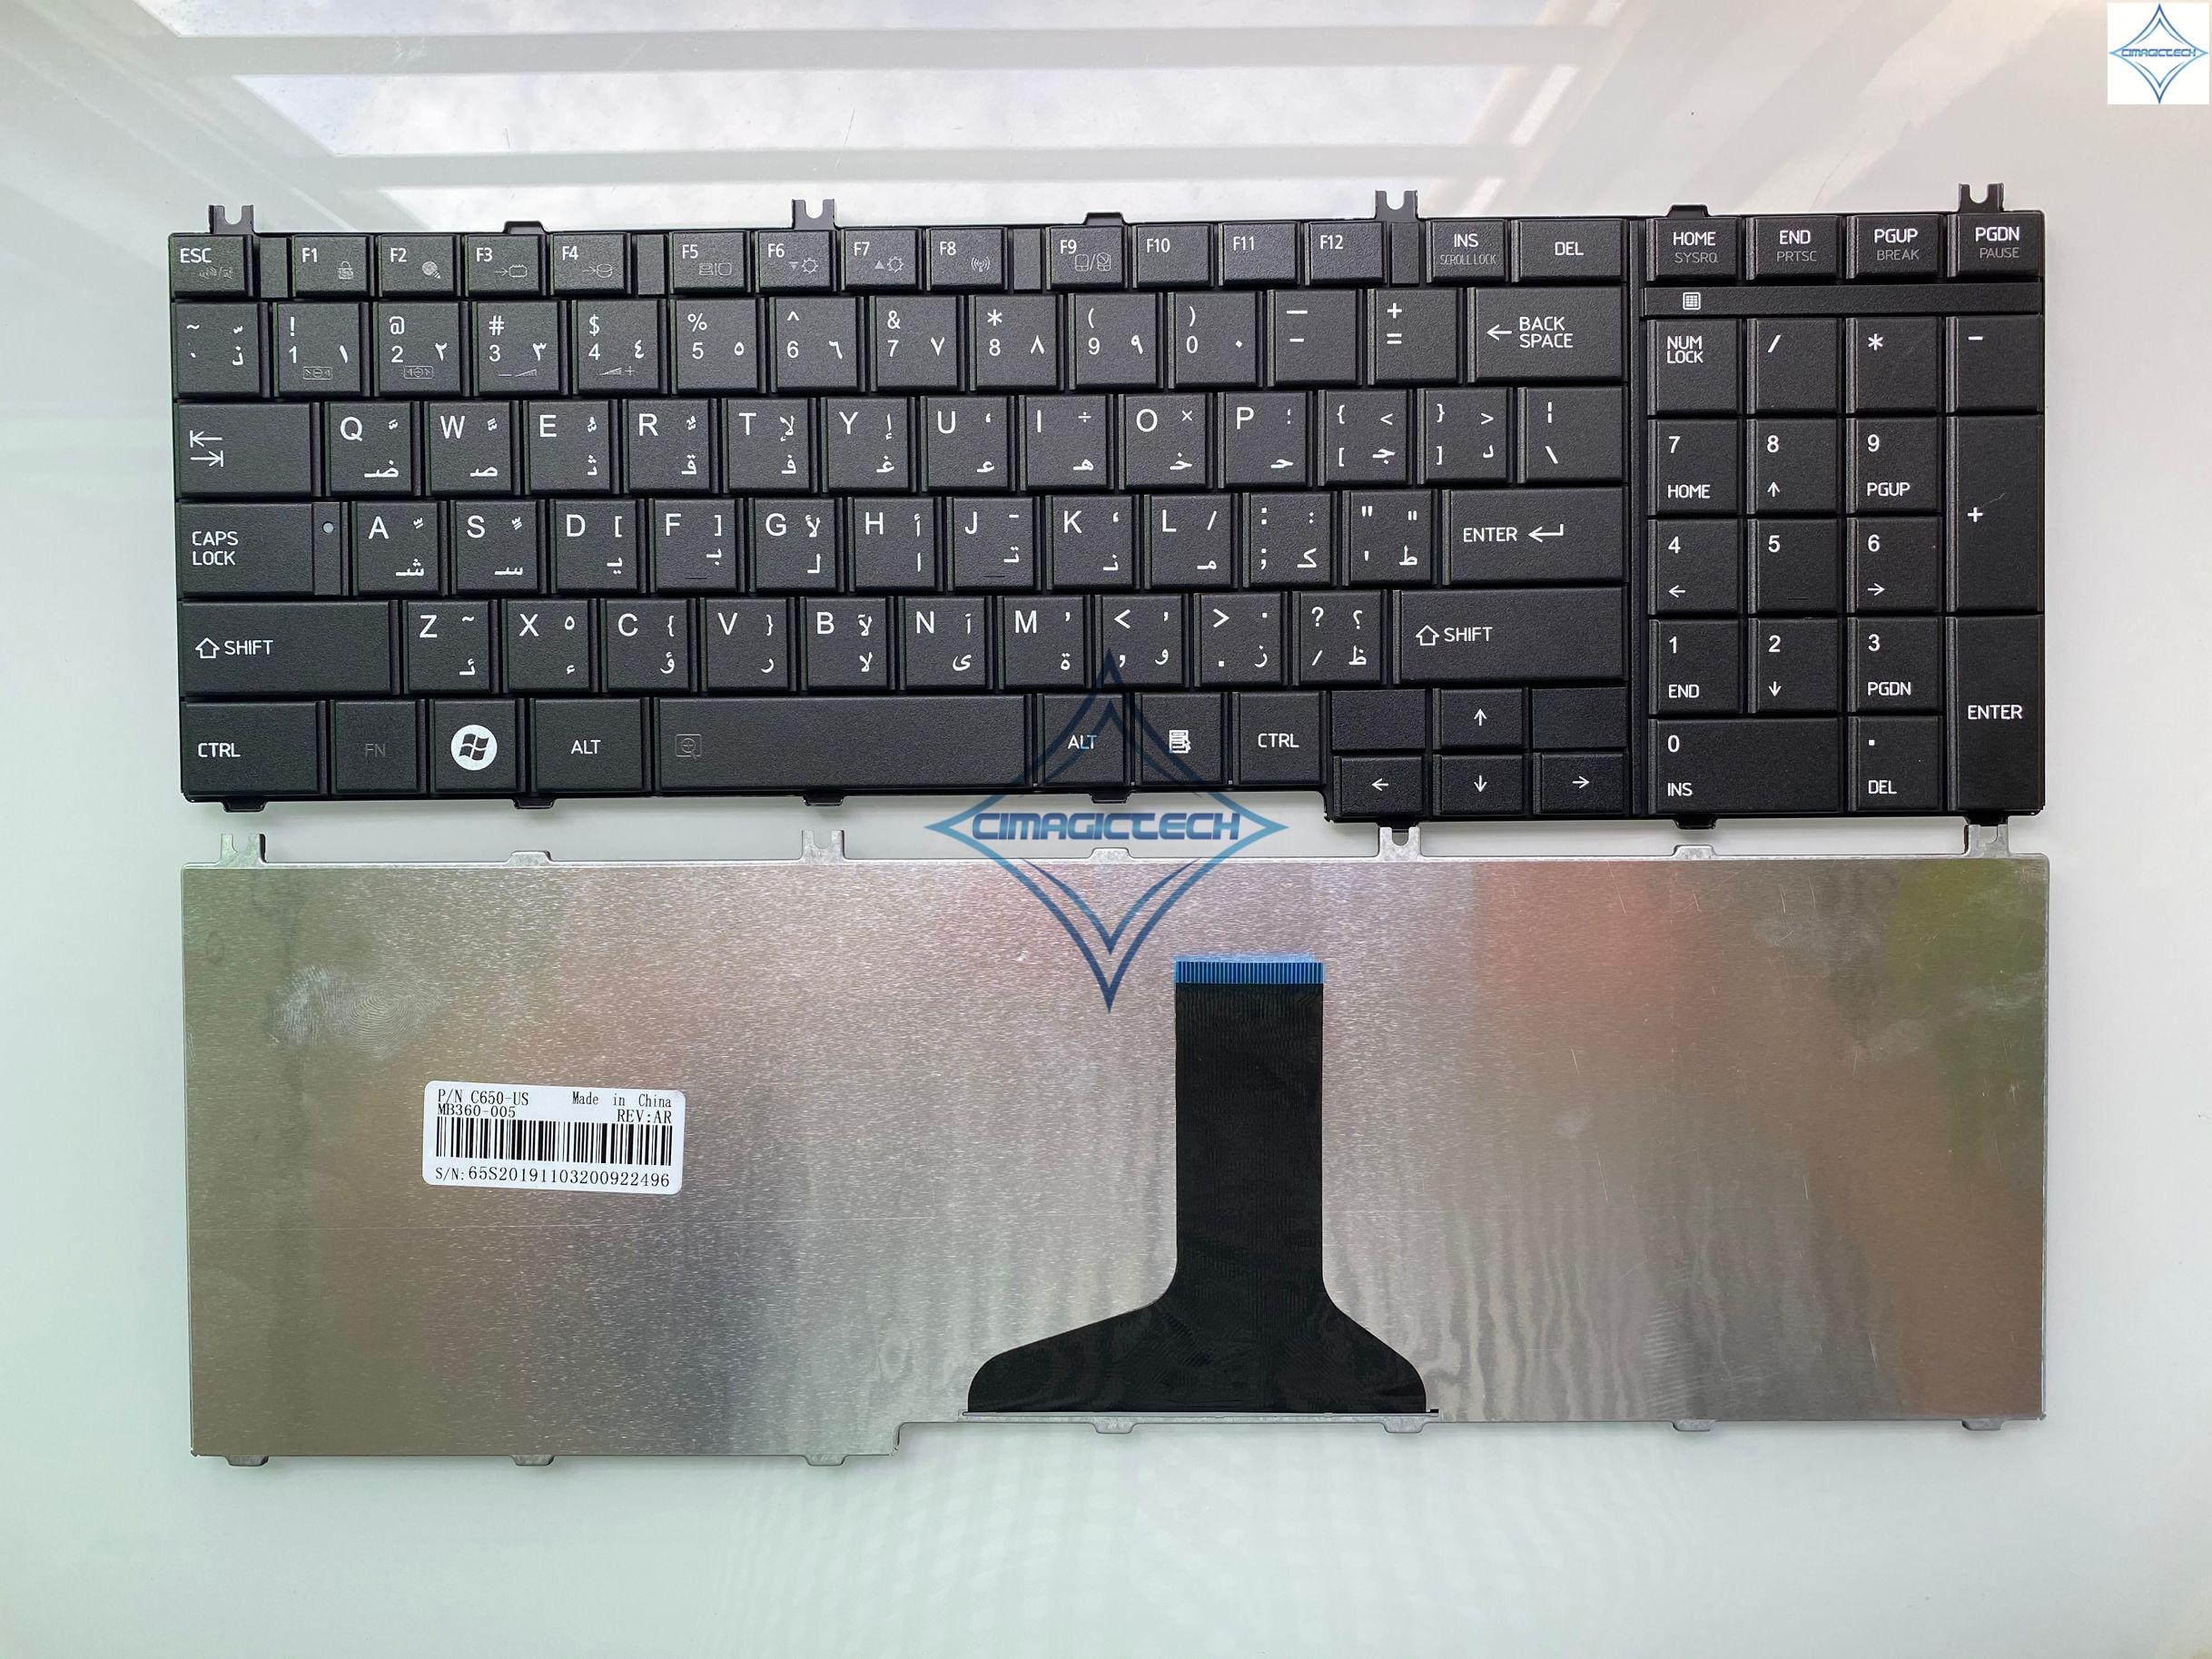 Nuevo Para Toshiba Satellite C650 C655 C655d C660 C665 C670 L650 L655 L670 L675 L750 L755 árabe Ar Portátil Teclado Laptop Keyboard For Toshibalaptop Keyboard Arabic Aliexpress